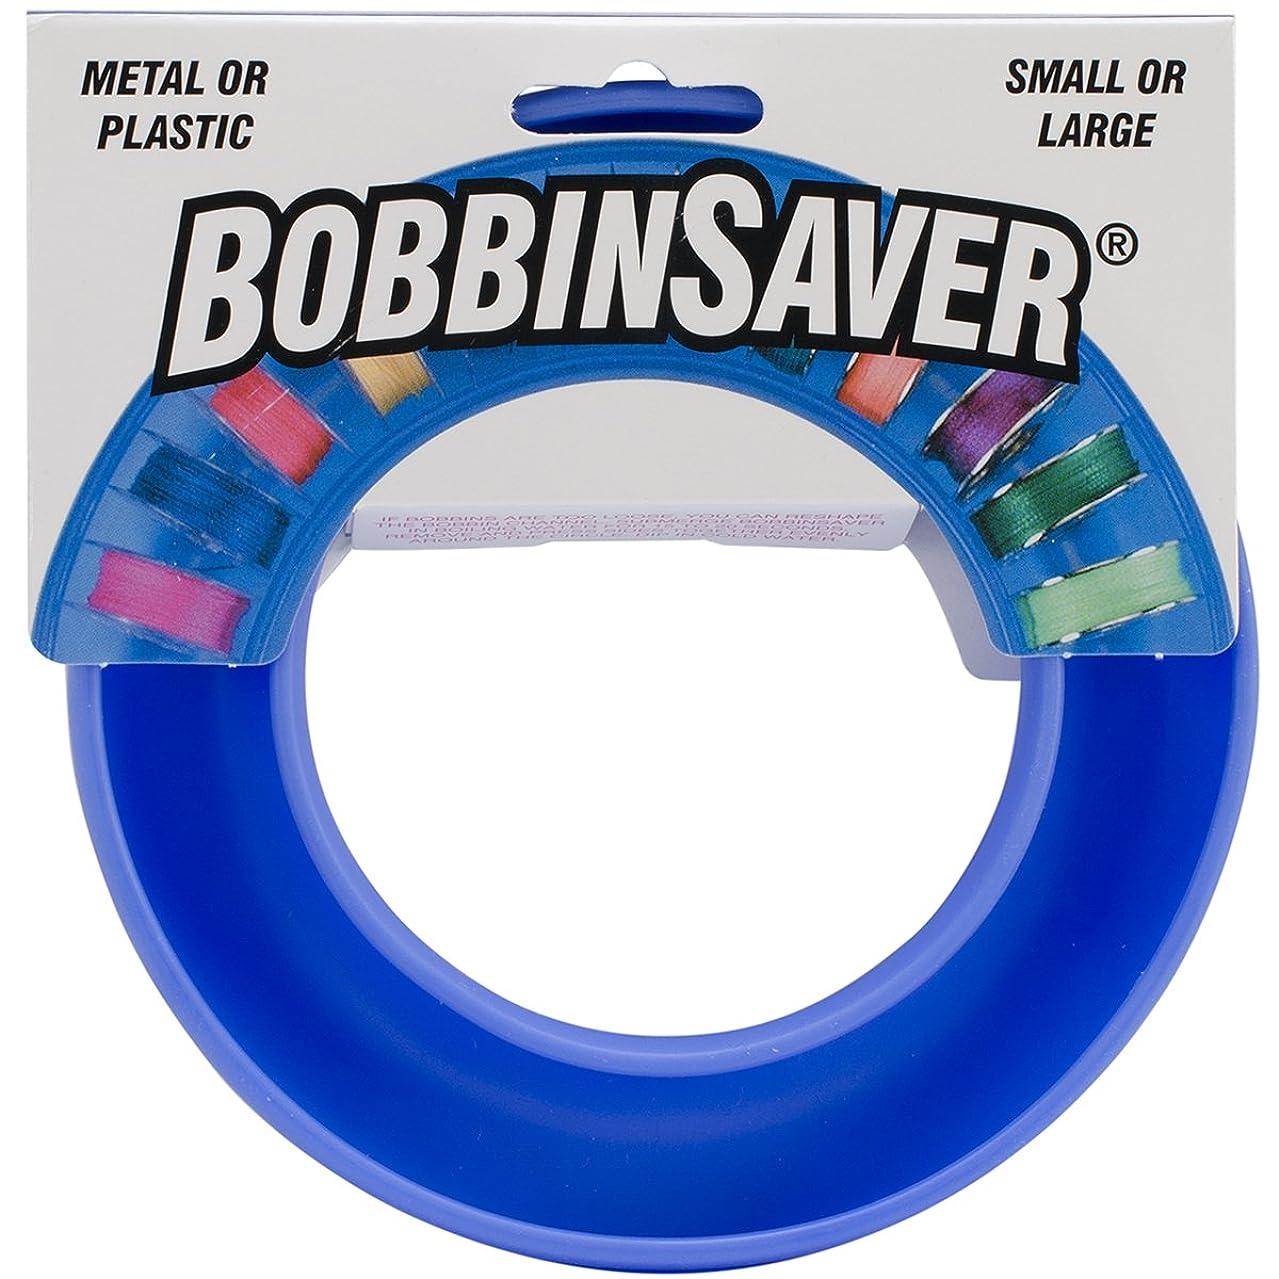 BobbinSaver Sewing Machine Bobbin Organizer - Holds 20+ Bobbins - Blue